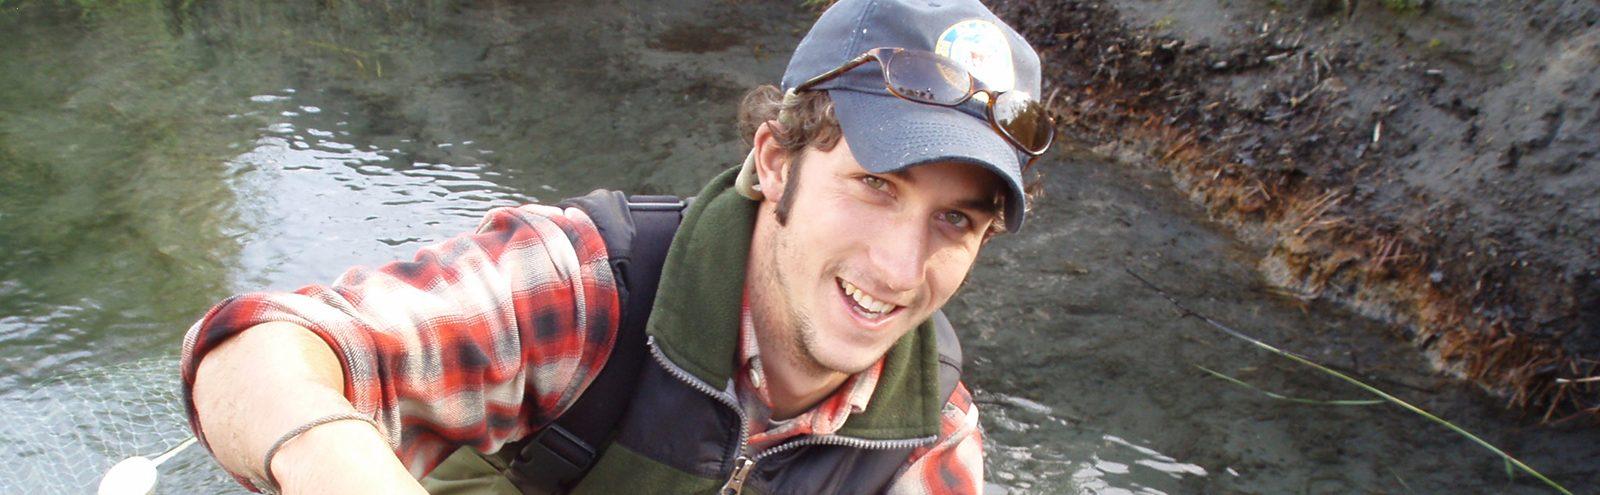 Northland alum fish geneticist holds up fish